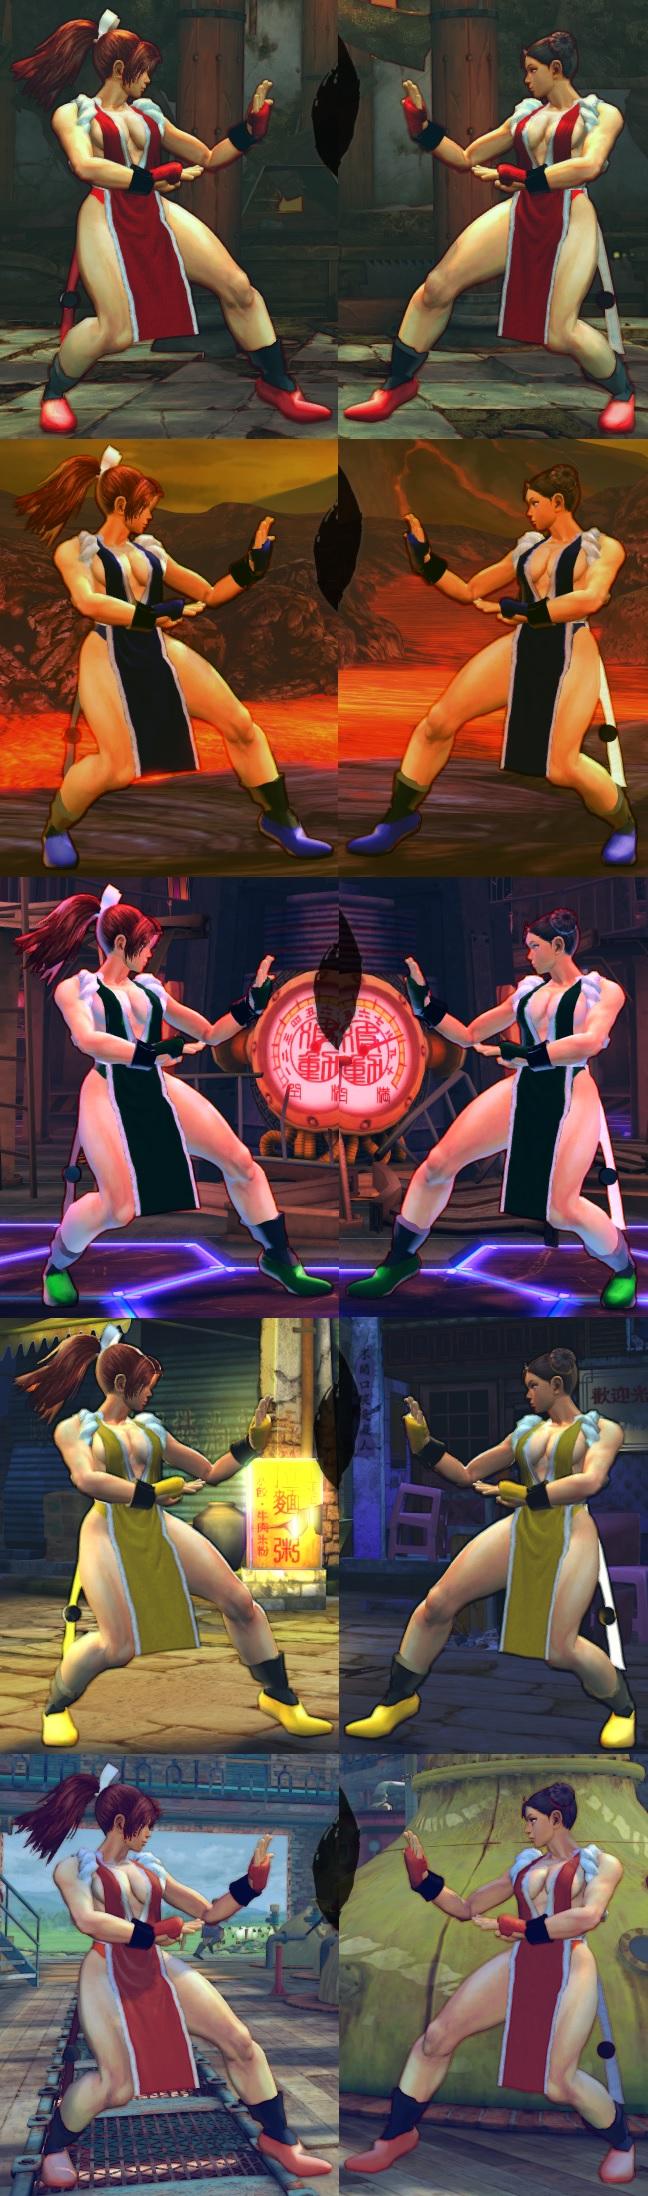 usf4_mod___chun_li__mai_shiranui_cosplay__shoes__by_segadordelinks-d4si3ql.jpg